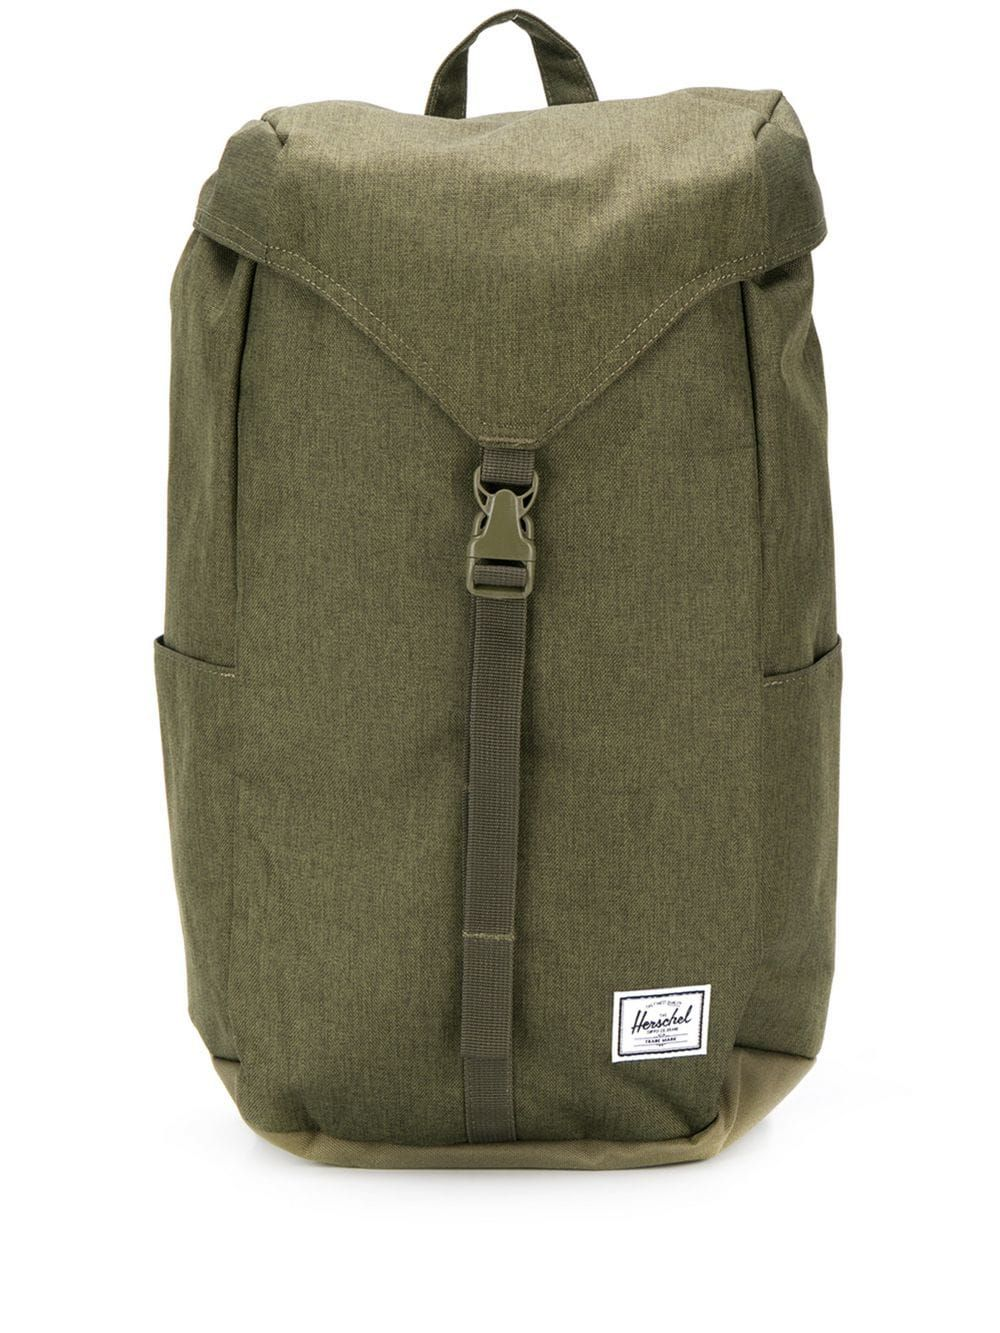 One Size Herschel Thompson Backpack Faded Indigo Denim